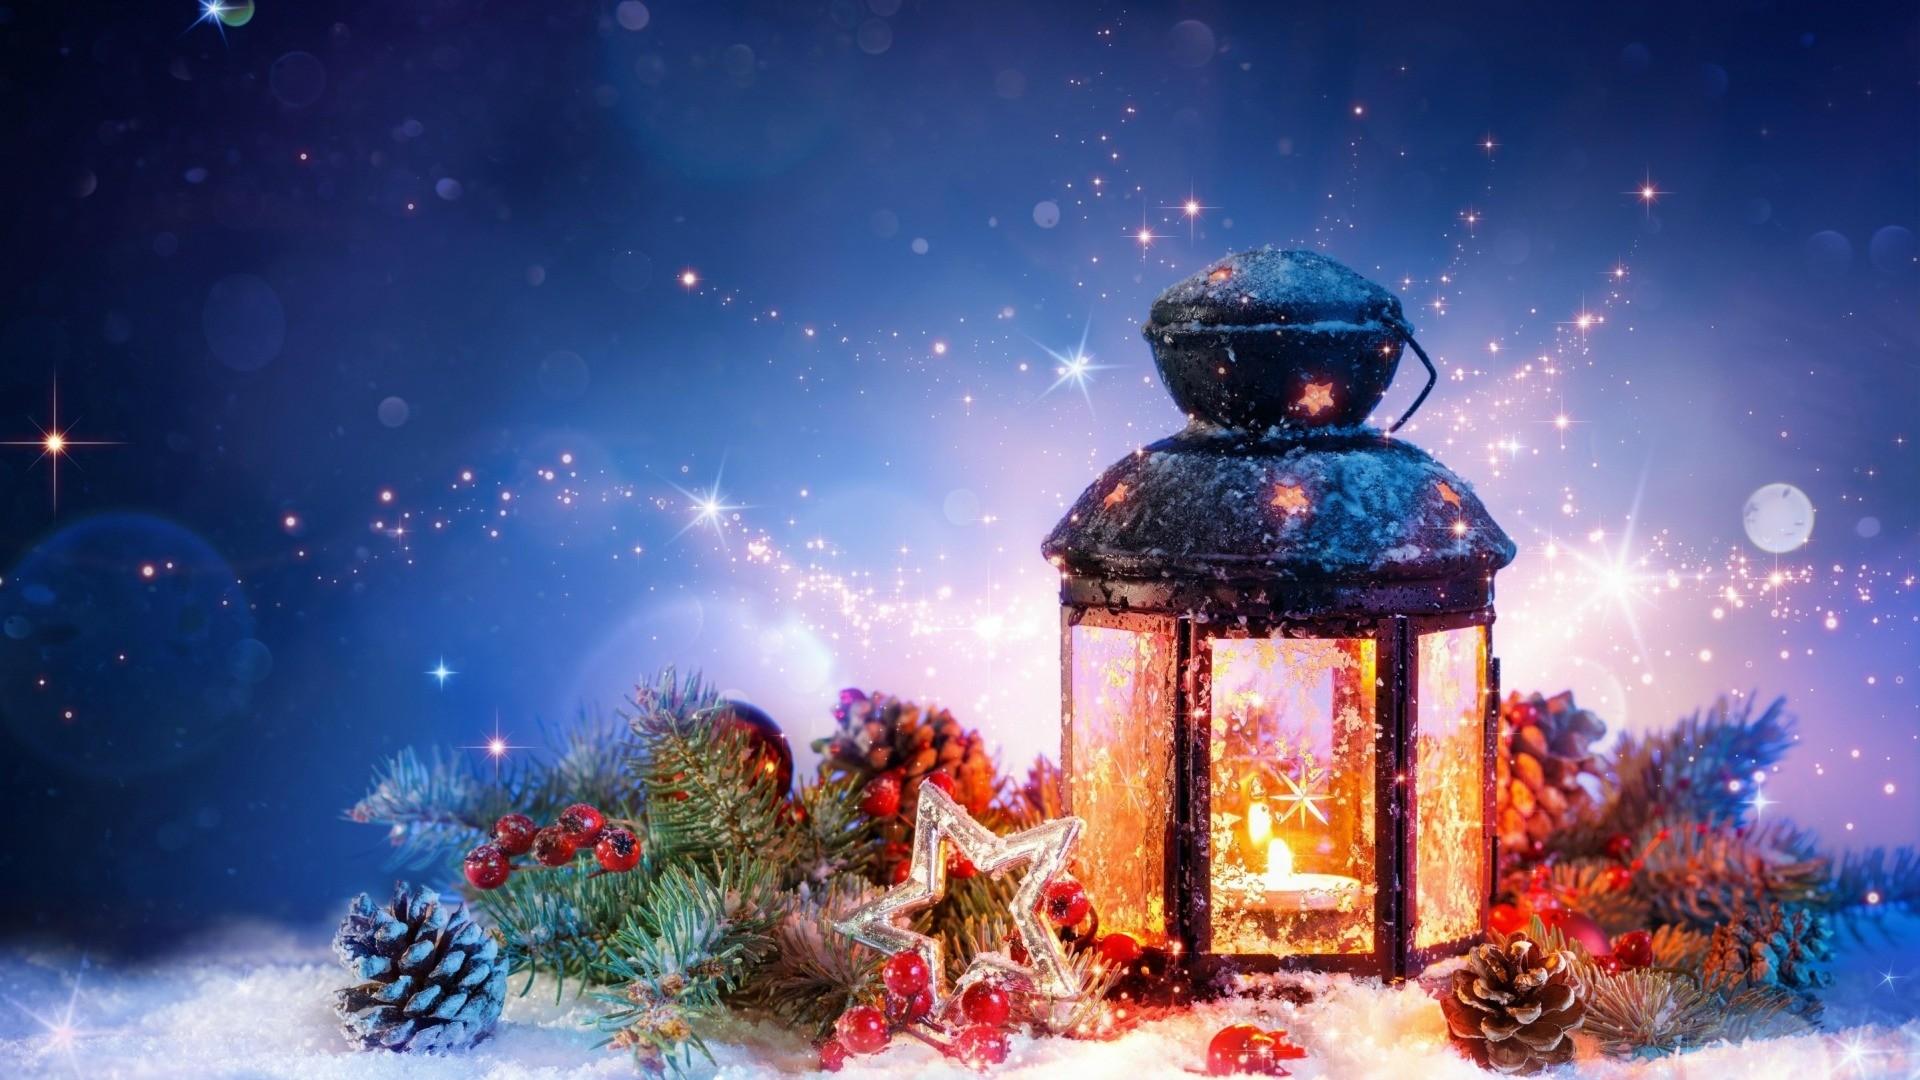 free-christmas-wallpaper-christmas-lantern-1920x1080p